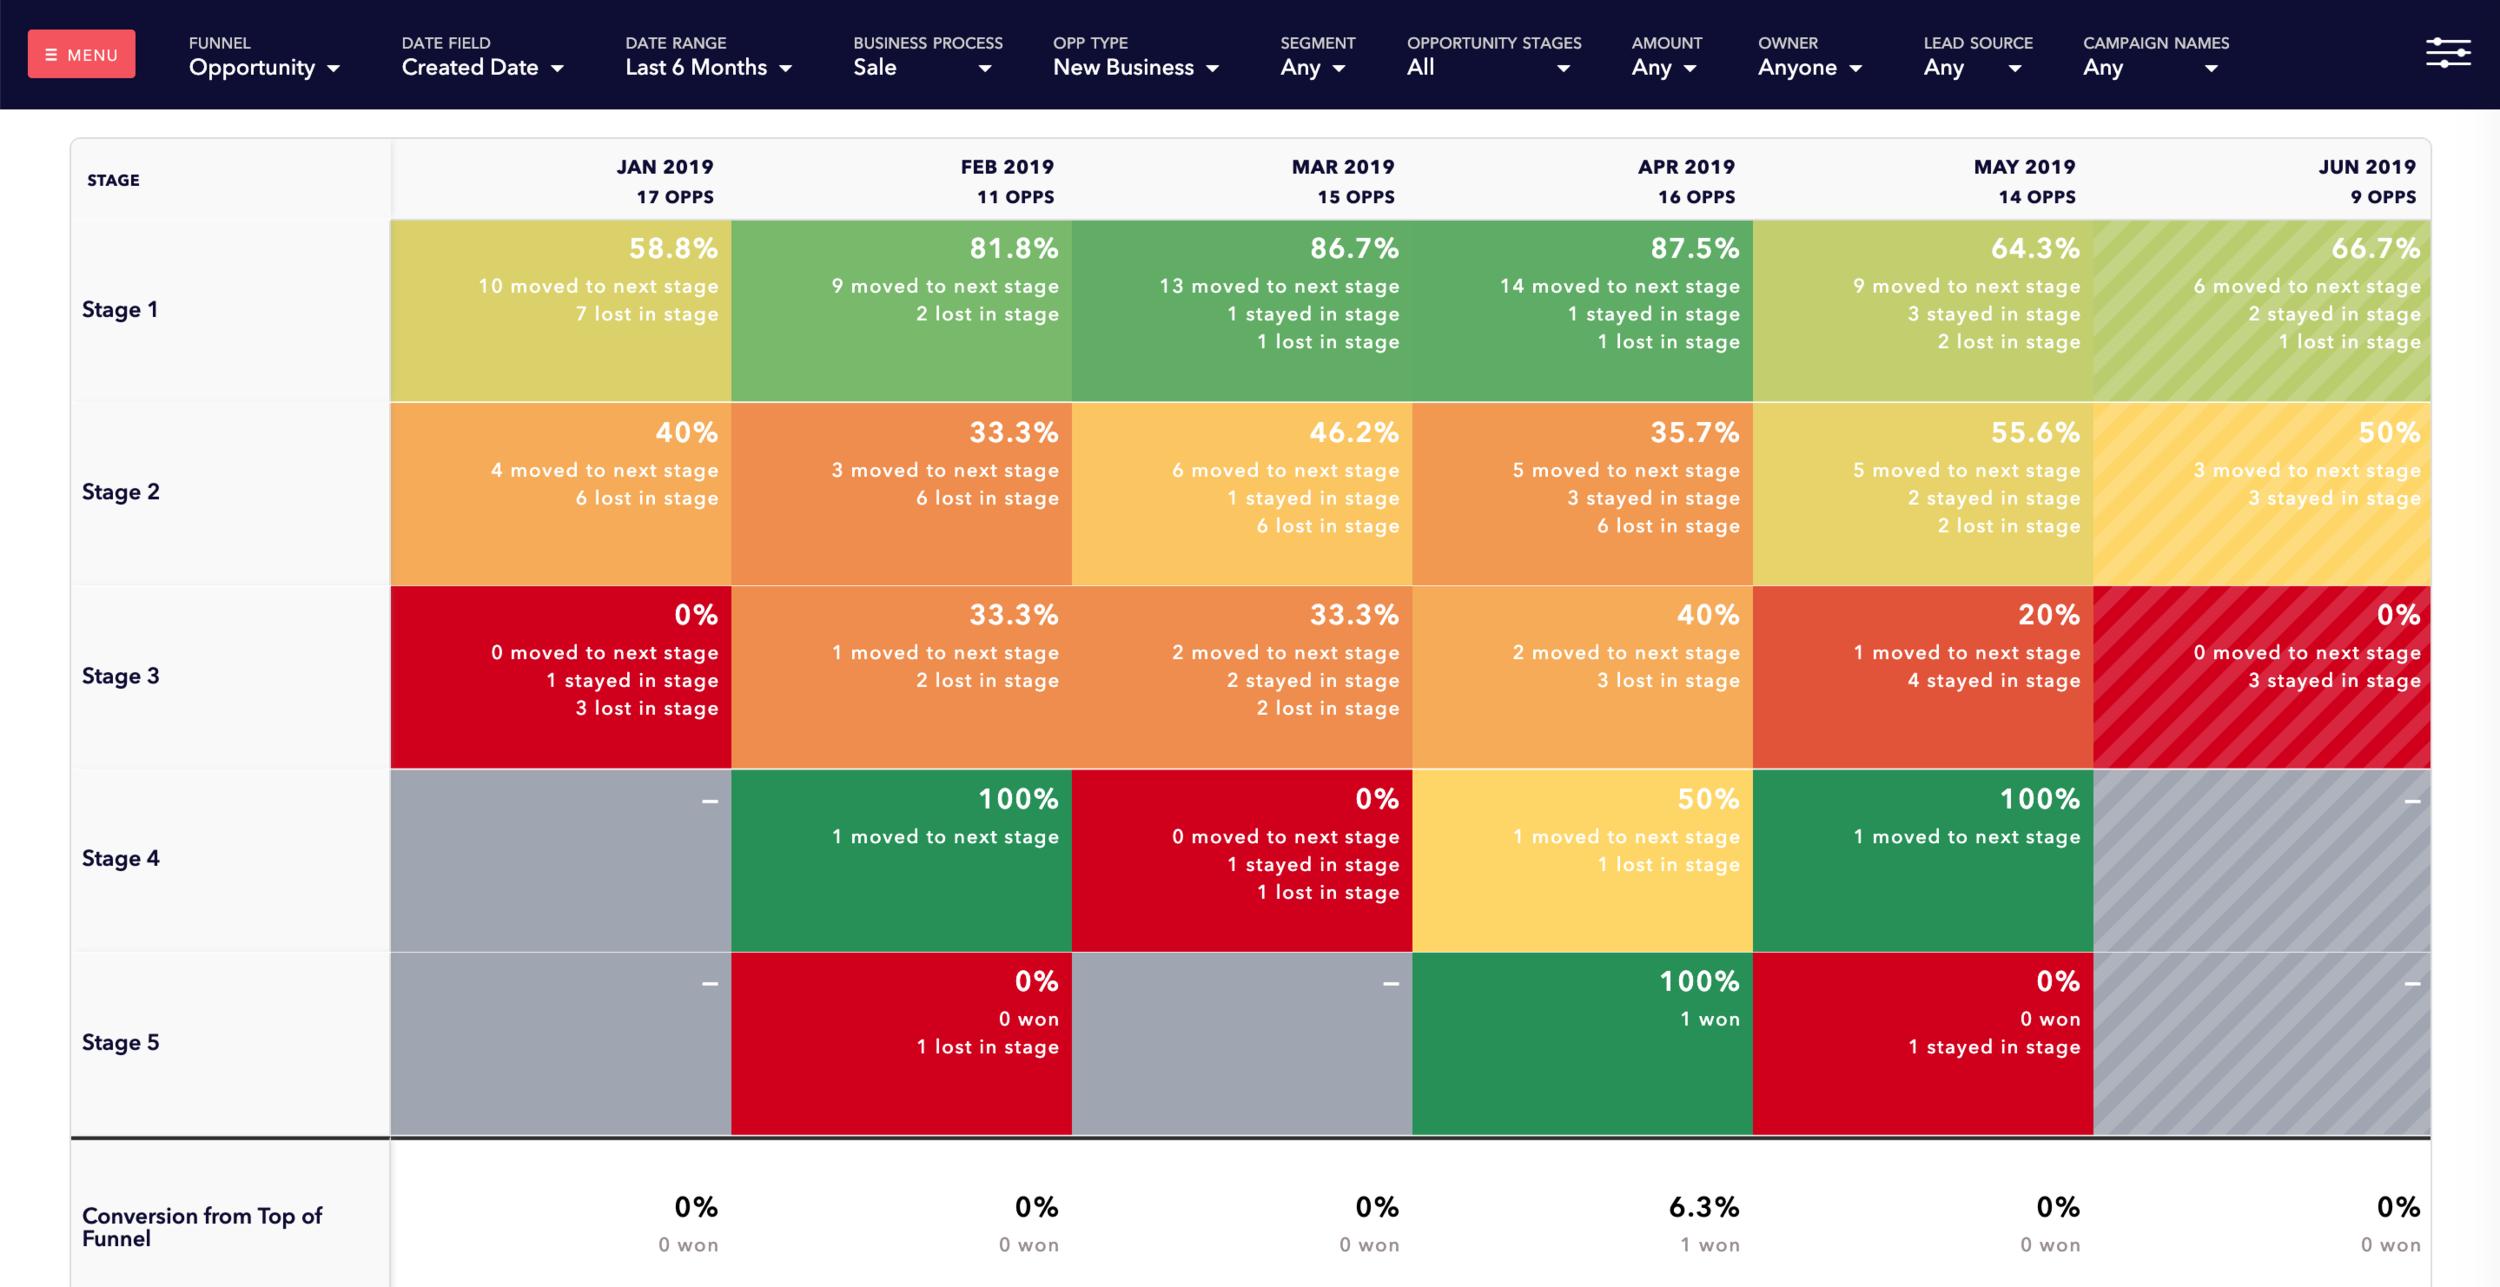 SDR Conversion Rates to Revenue